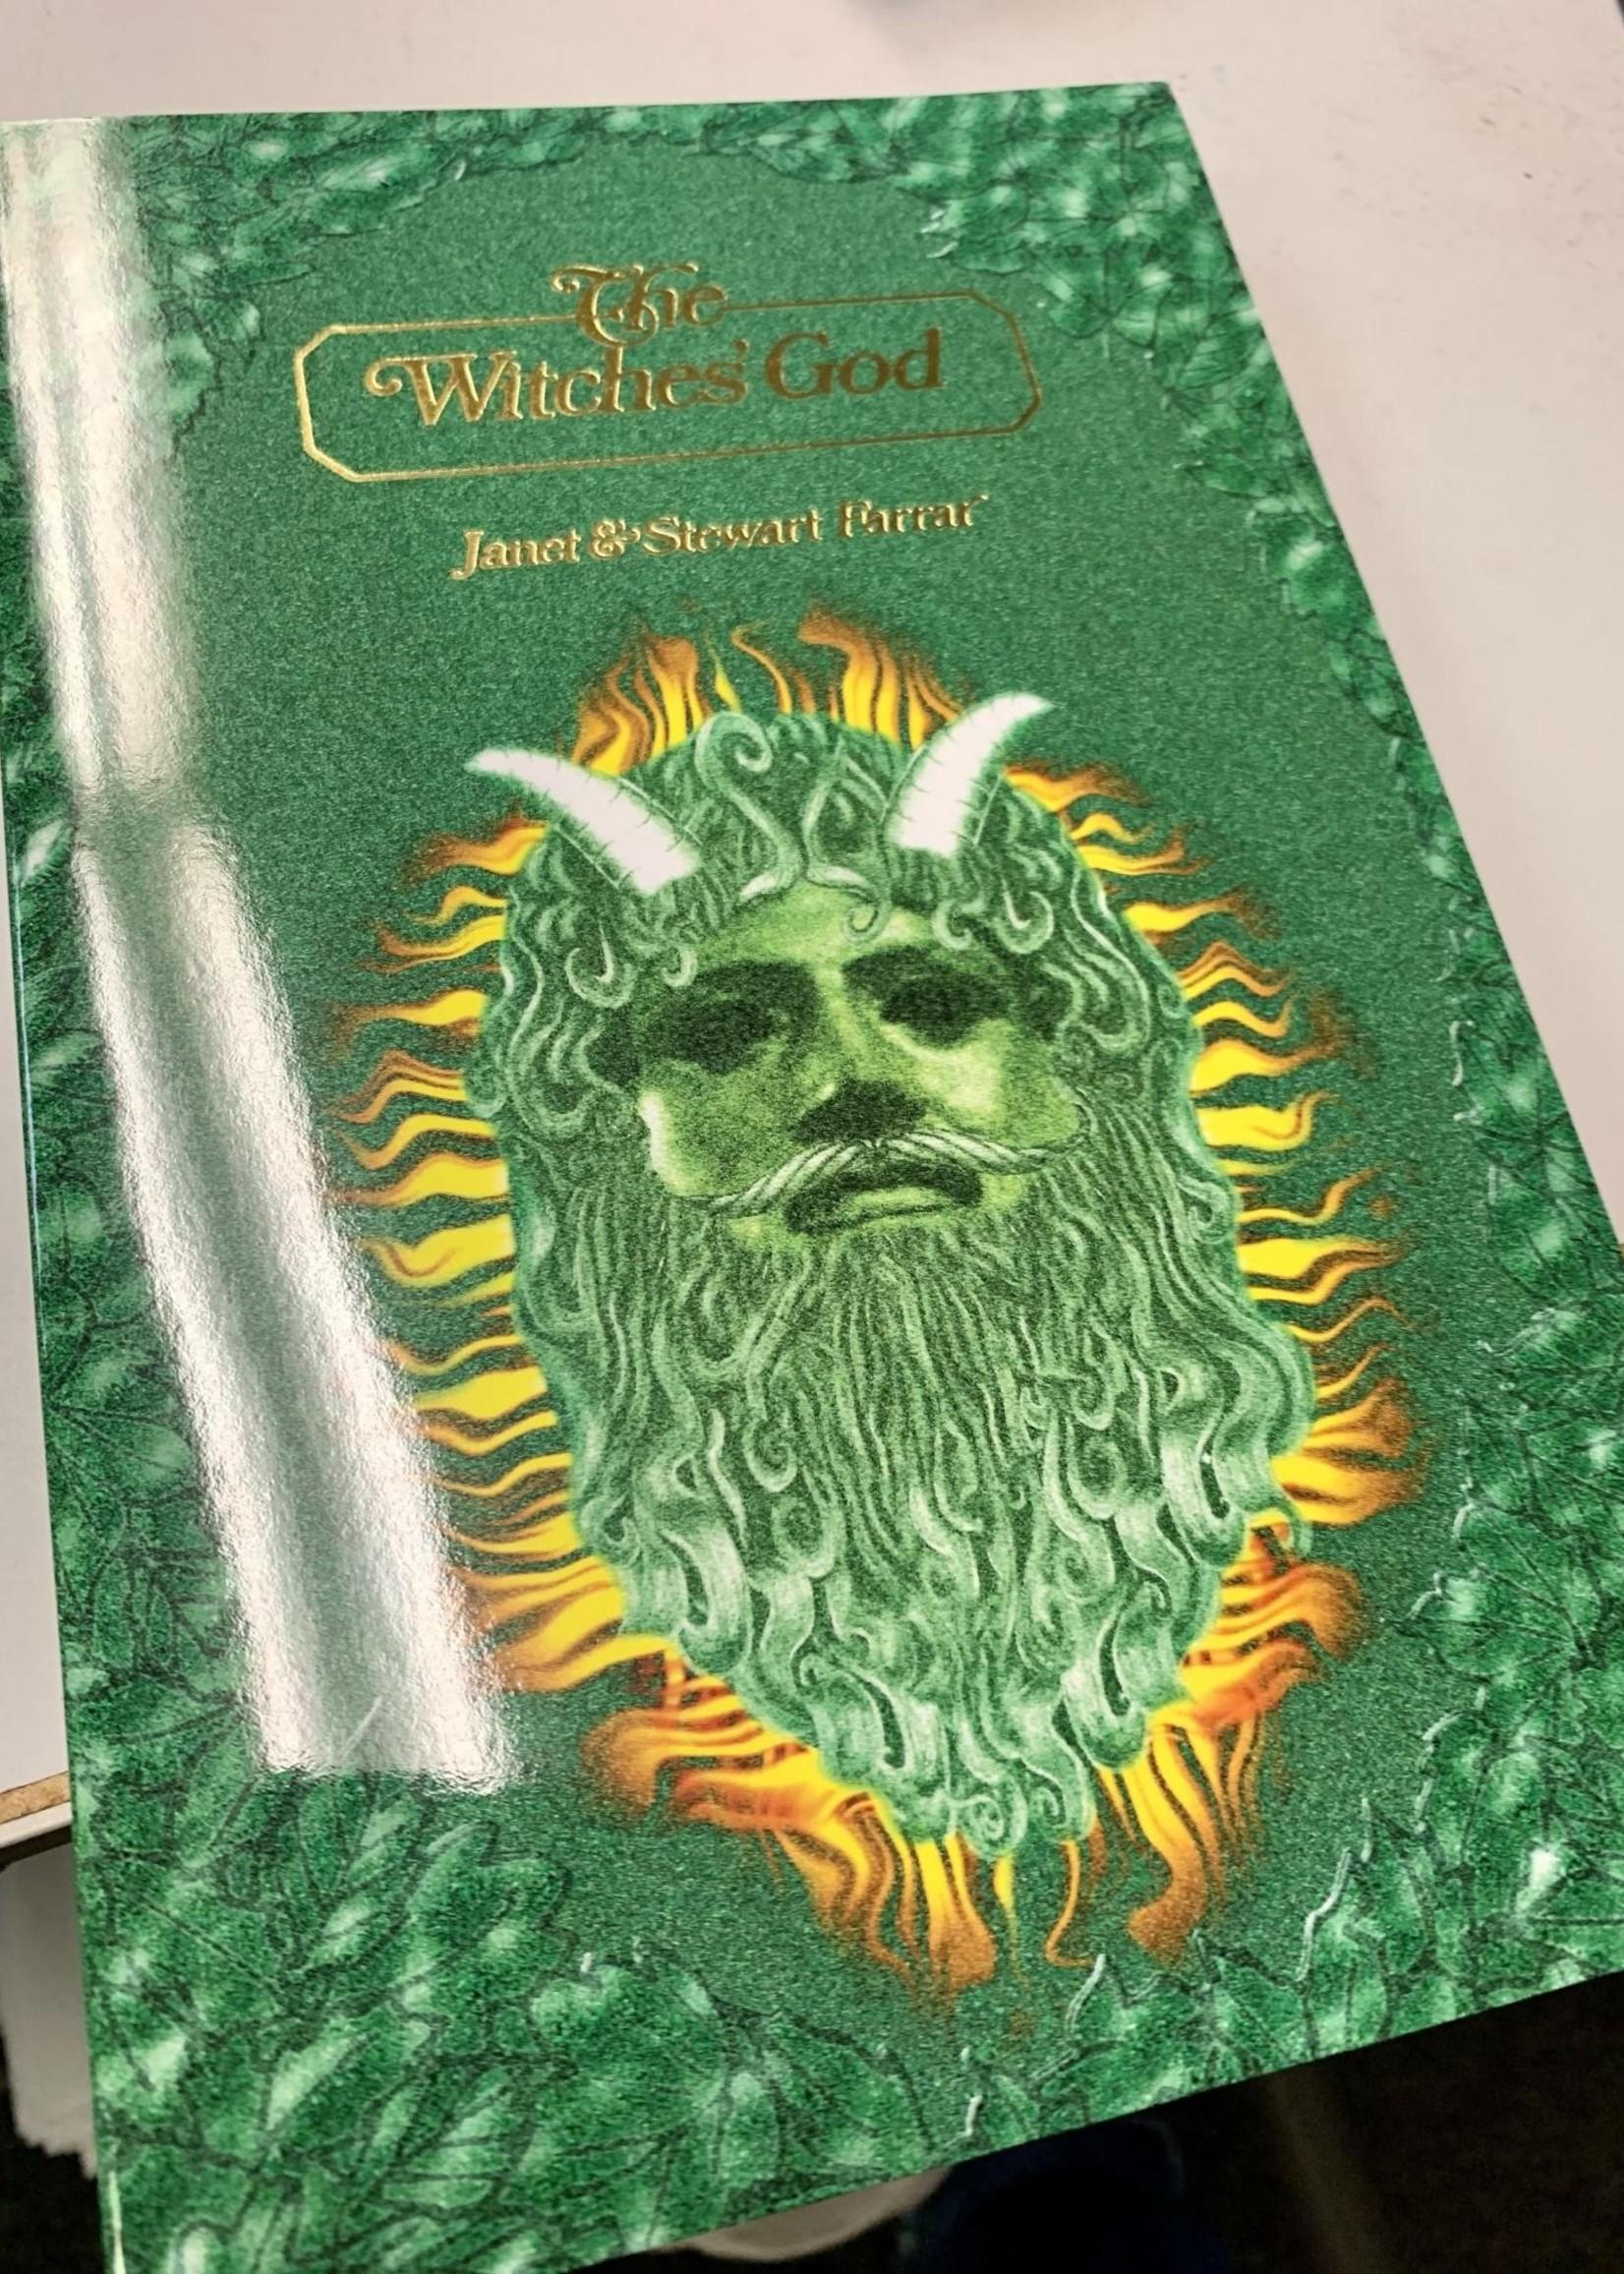 Witches' God - by Farrar & Farrar